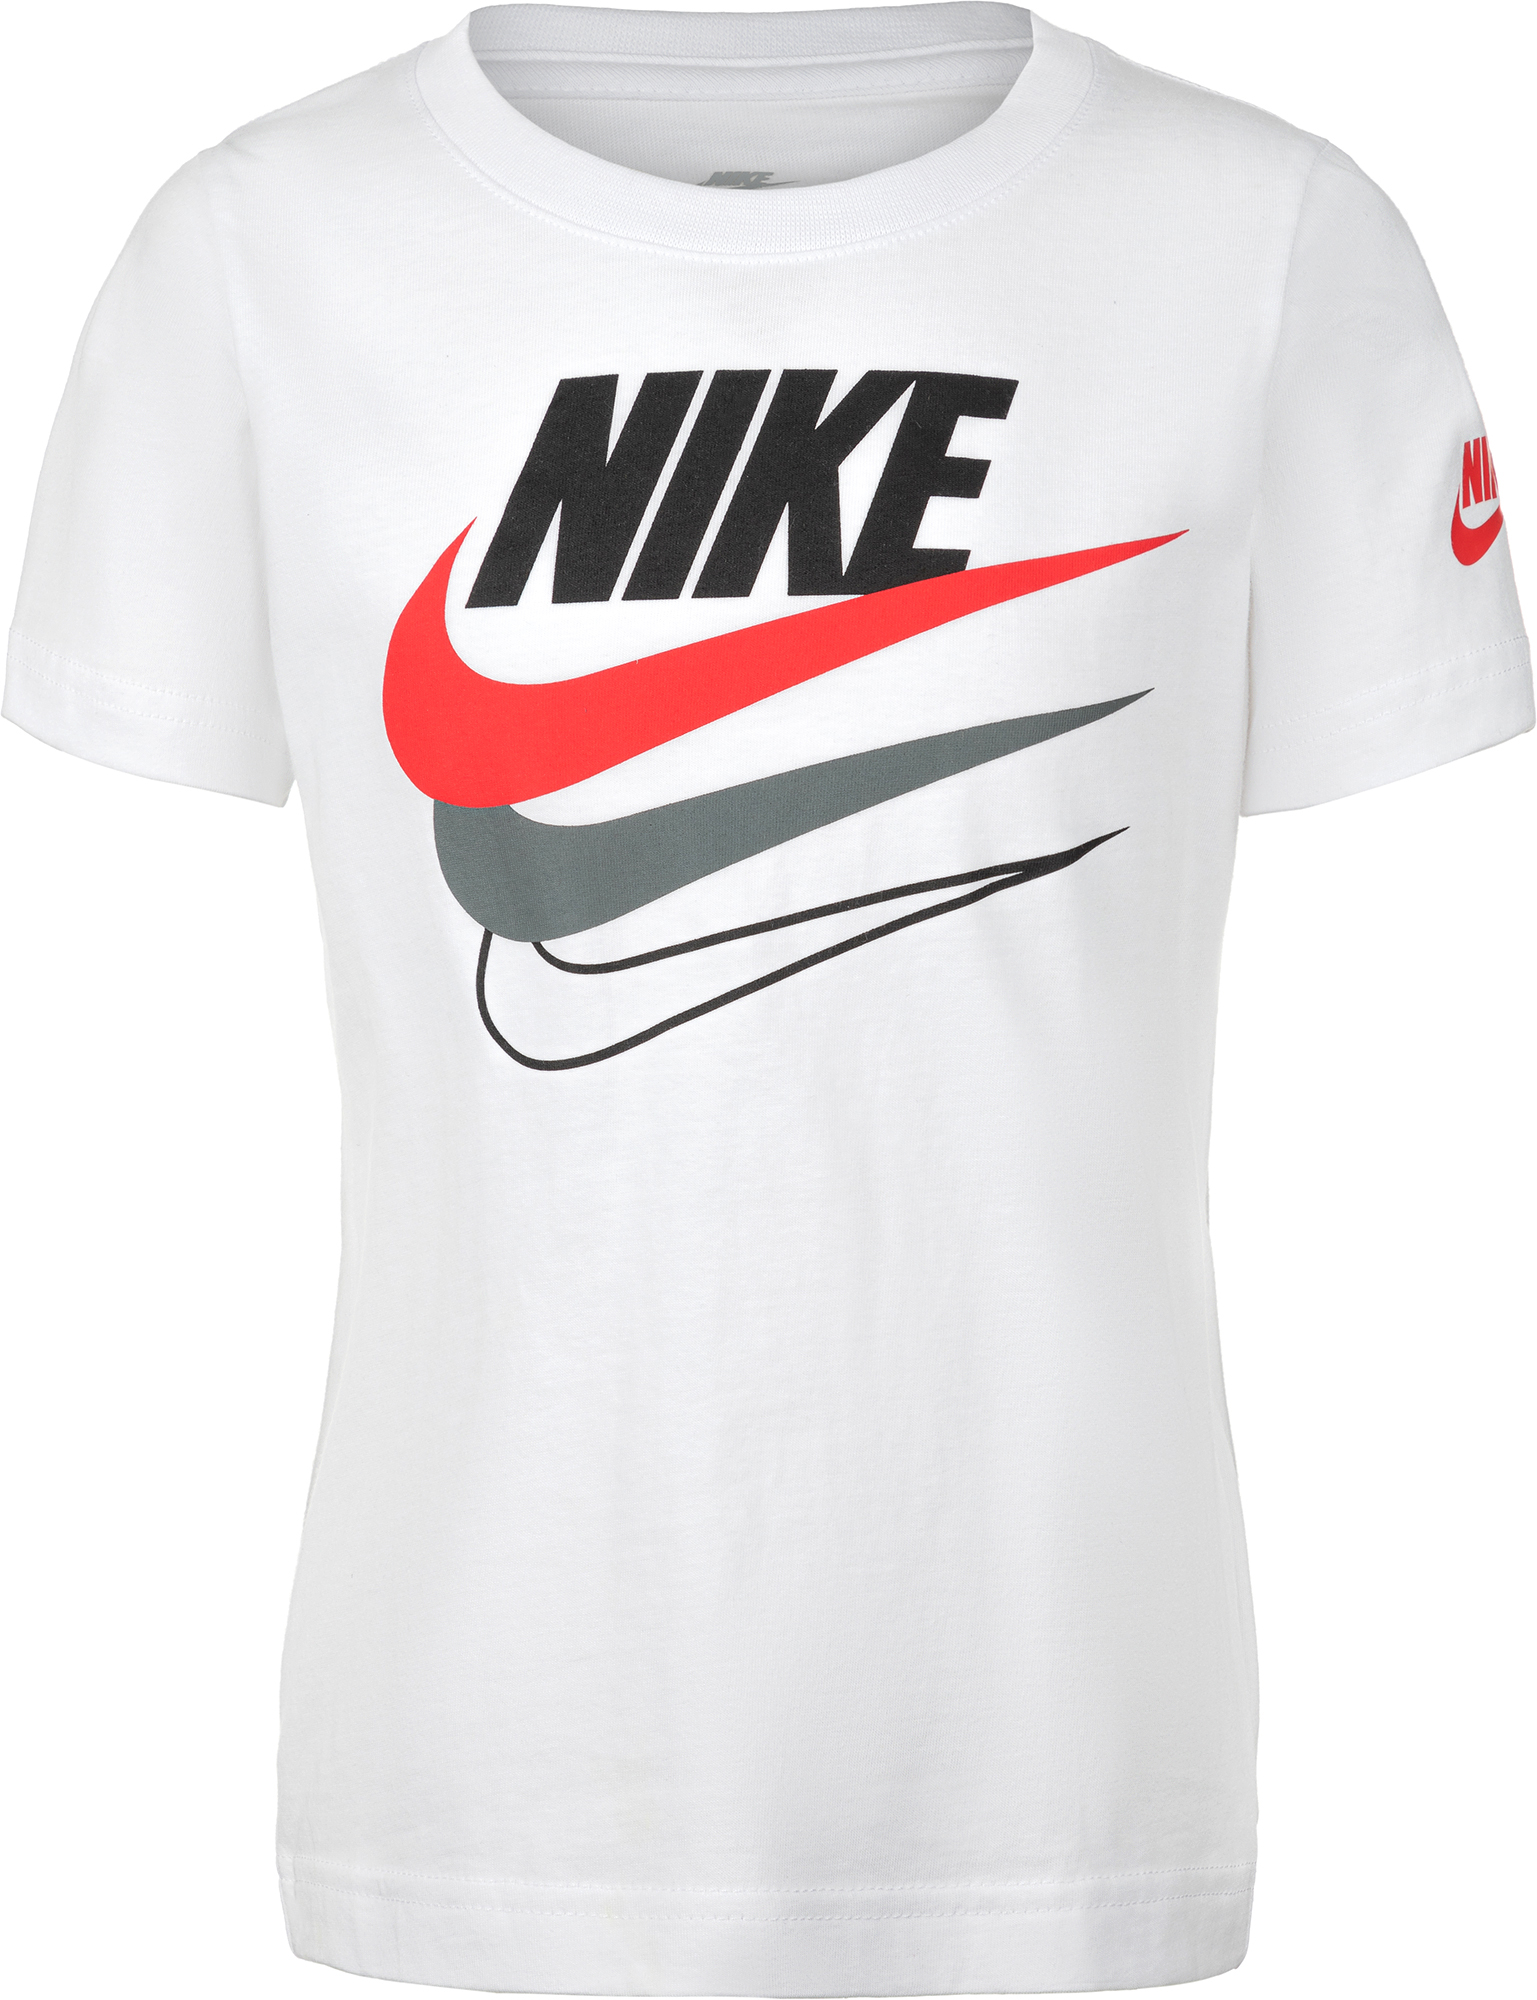 Nike Футболка для мальчиков Nike Multi-Branded, размер 110 nike футболка для мальчиков nike geo basketball